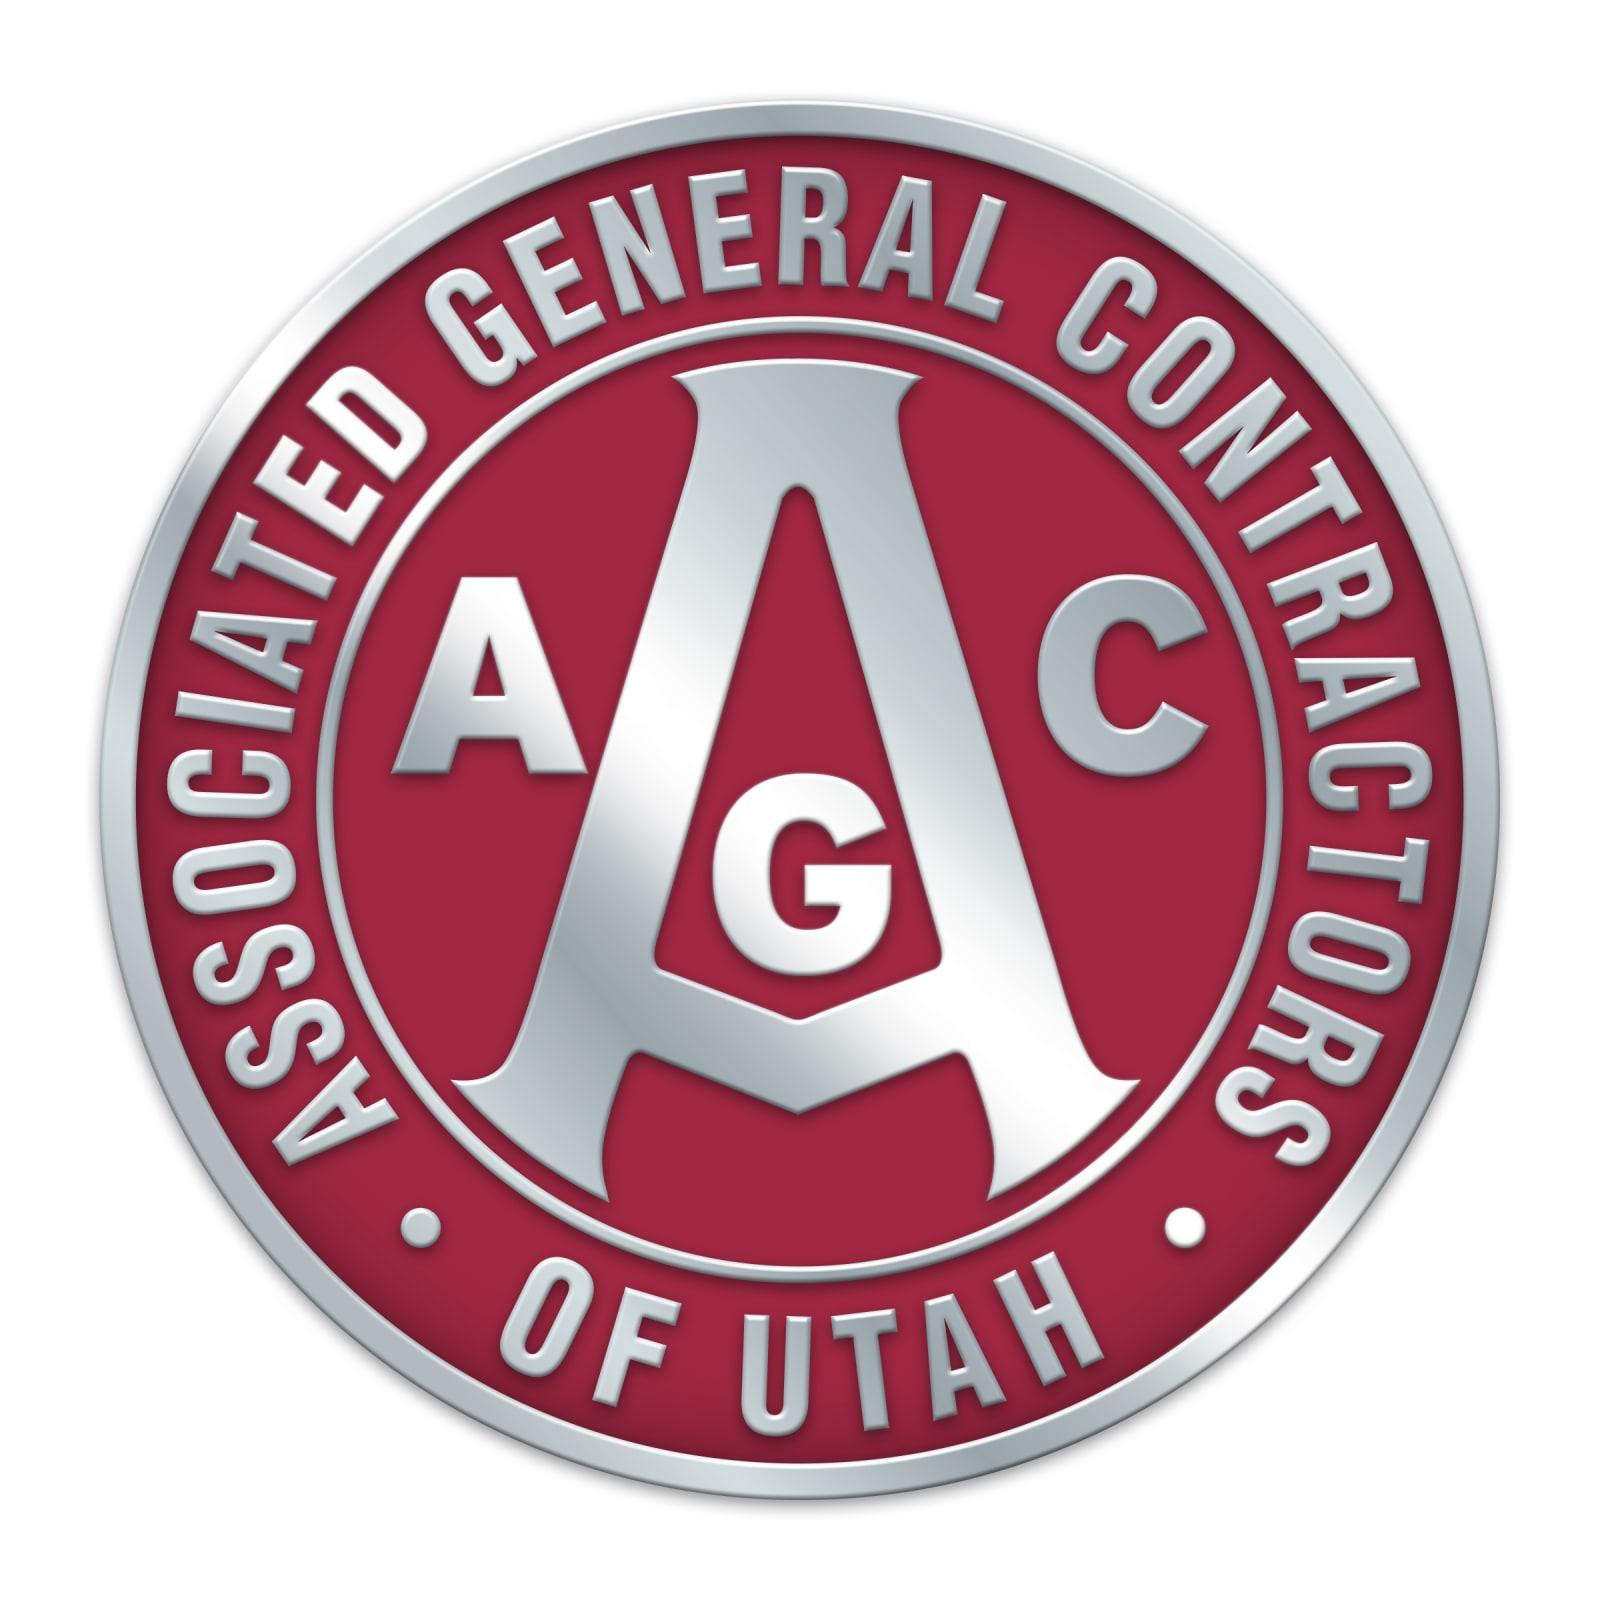 AGC of Utah logo